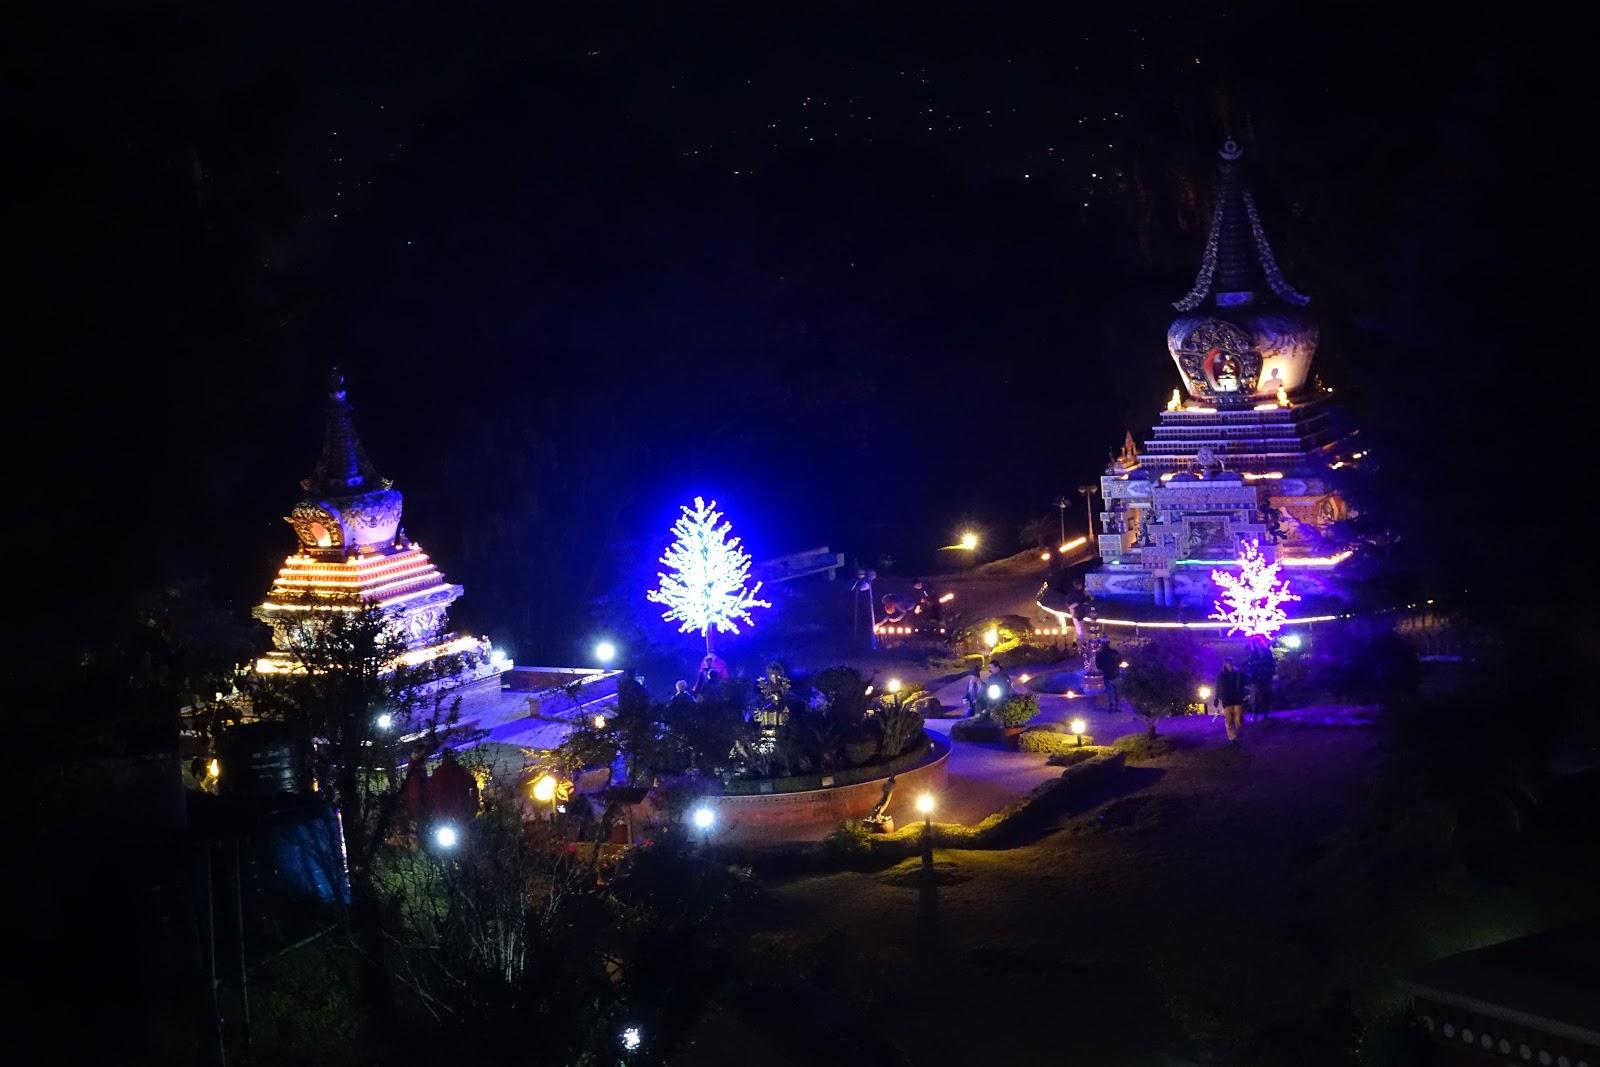 Kopan Monastery at Night, Khensur RinpocheLamaLhundrup'sstupatotheleftandGesheLamaKonchog'sstupatotheright andnewlightofferings onthetrees, Nepal, December 2014. Photo by Ven. Roger Kunsang.